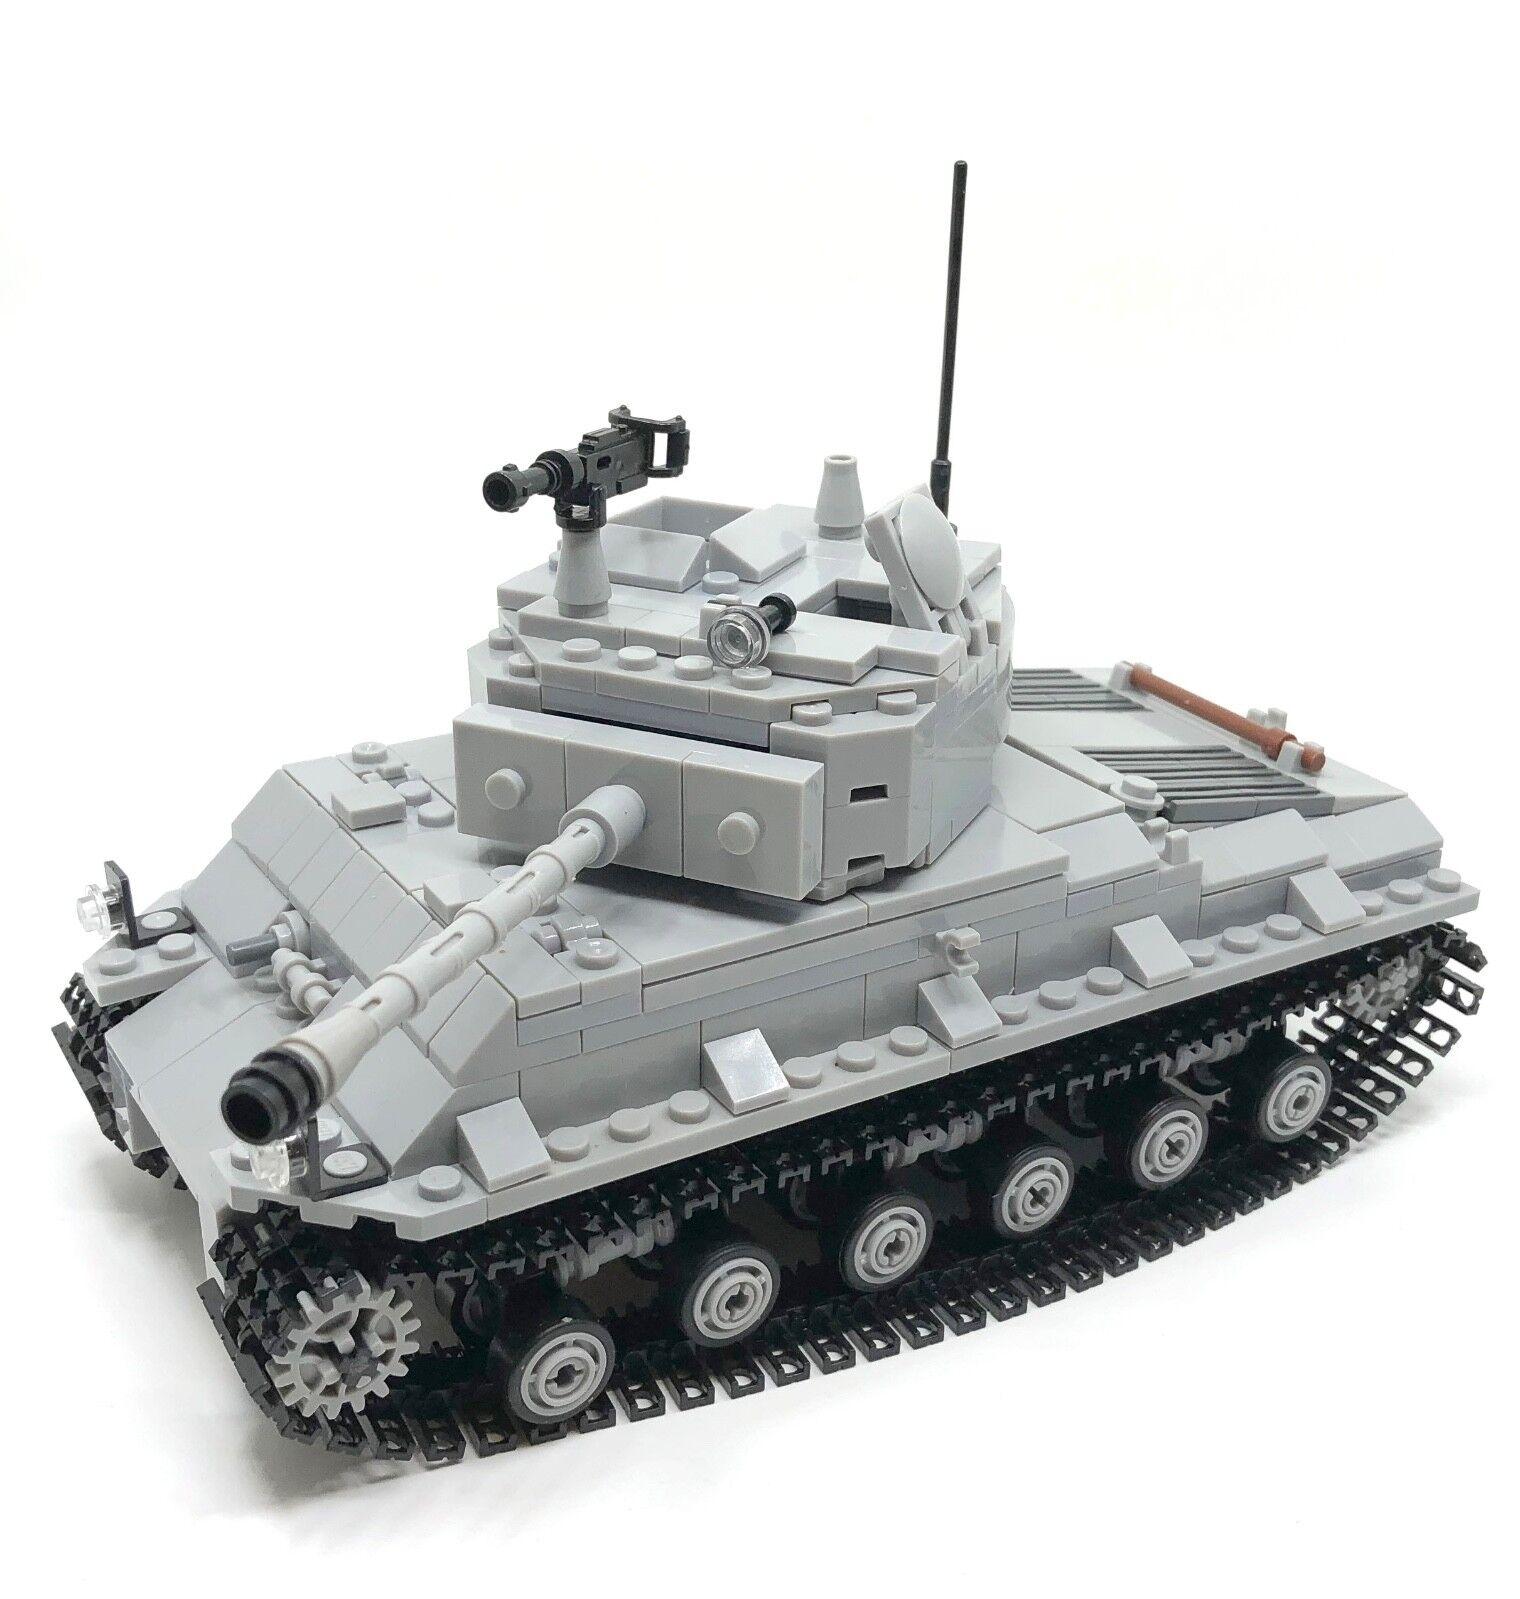 Por enCochego de la segunda guerra mundial M4A3E8 Tanque Sherman para Minifigura US Army m4 MOC